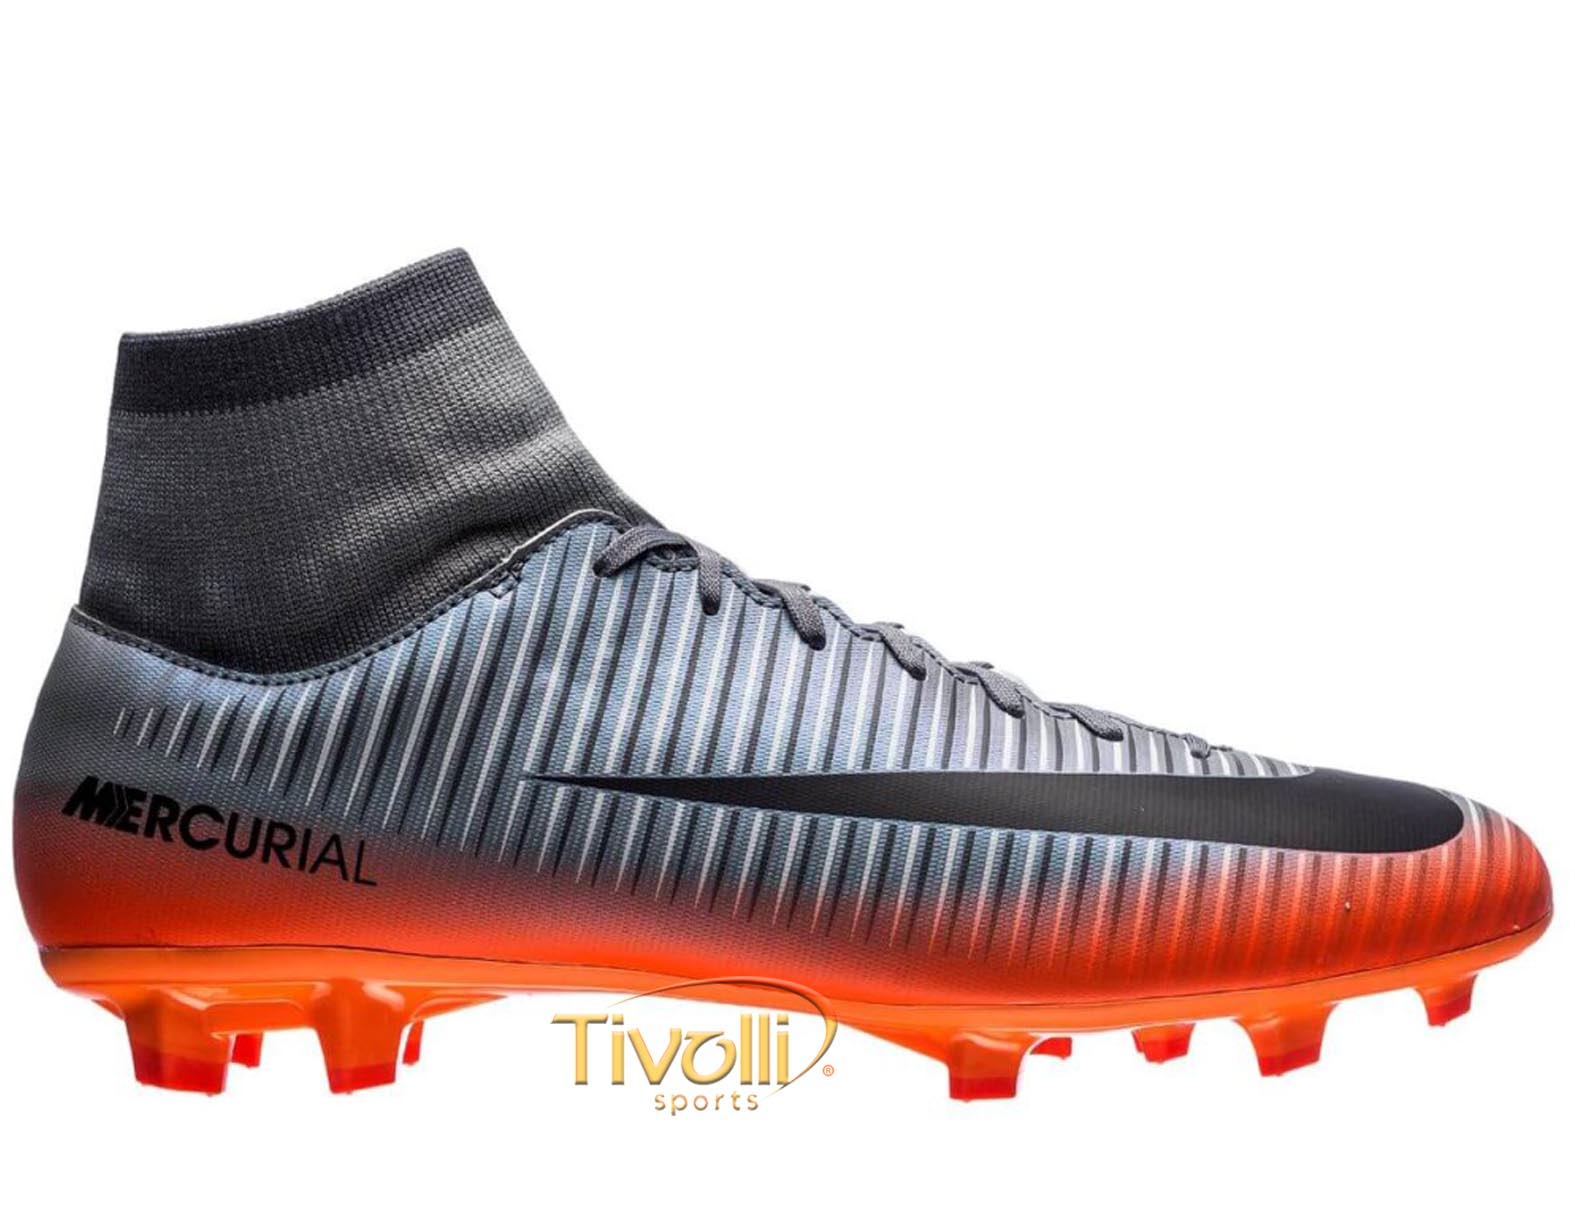 eeffee0fbf425 Chuteira Nike Mercurial Victory VI CR7 DF FG